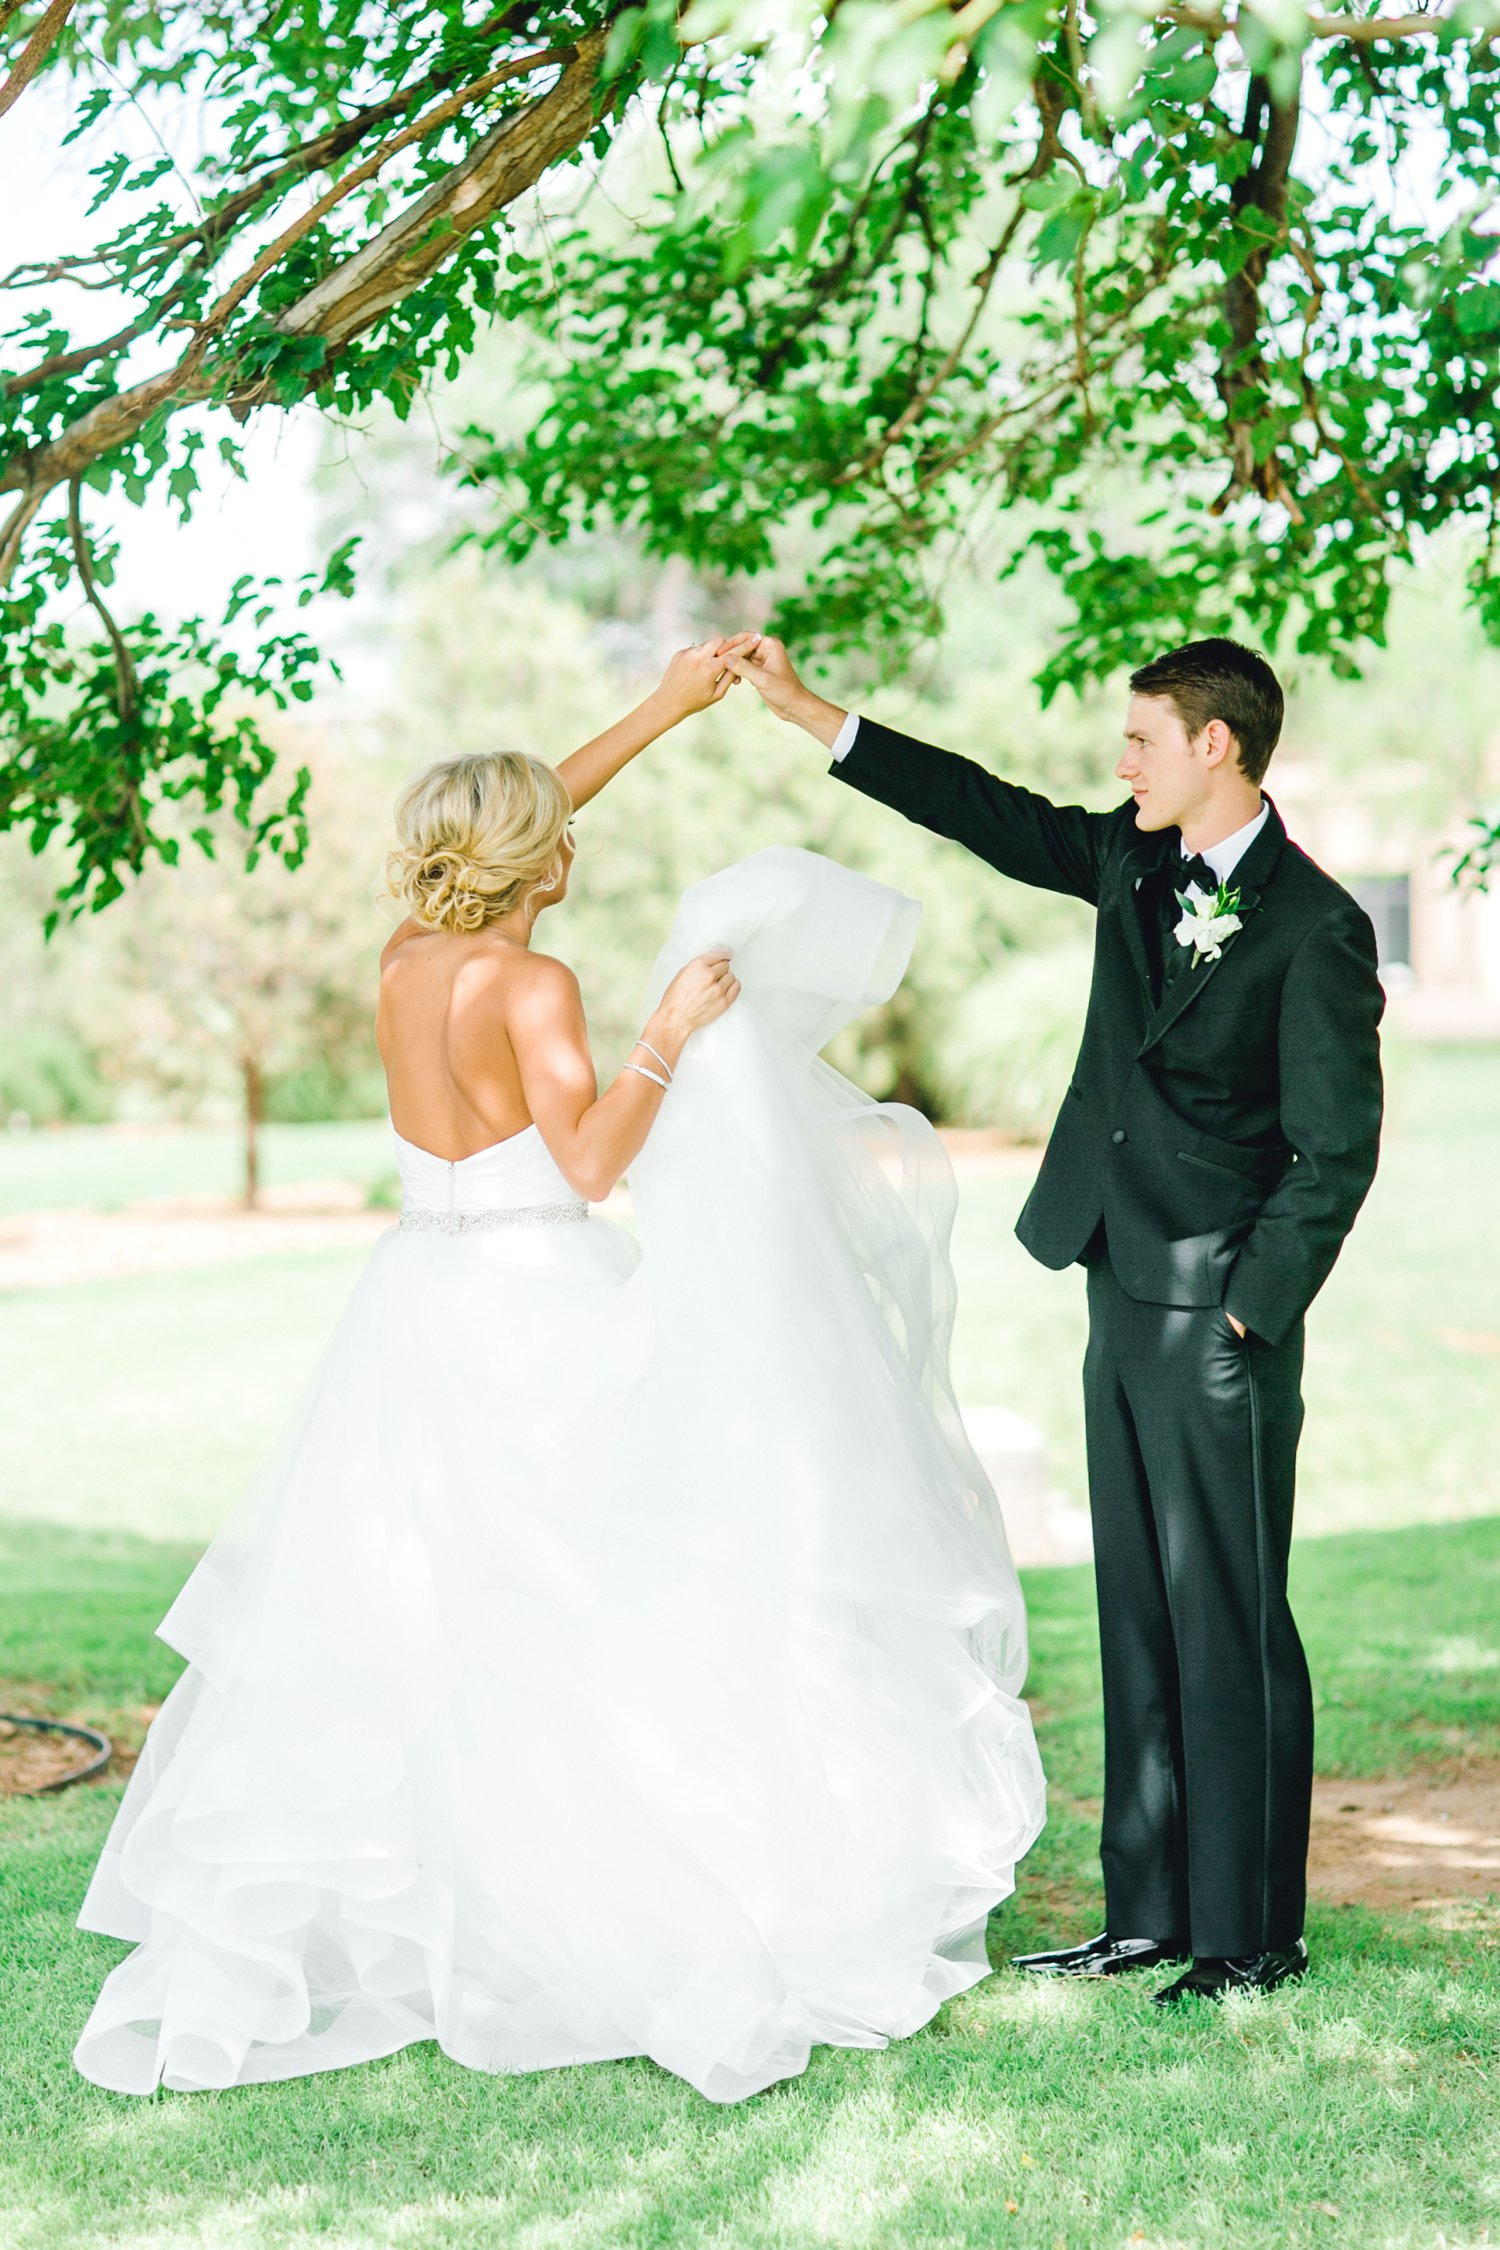 Taylor-and-Brock-Williams-Texas-Tech-University-Merket-Alumni-Center-Lubbock-Photographer-ALLEEJ0088.jpg